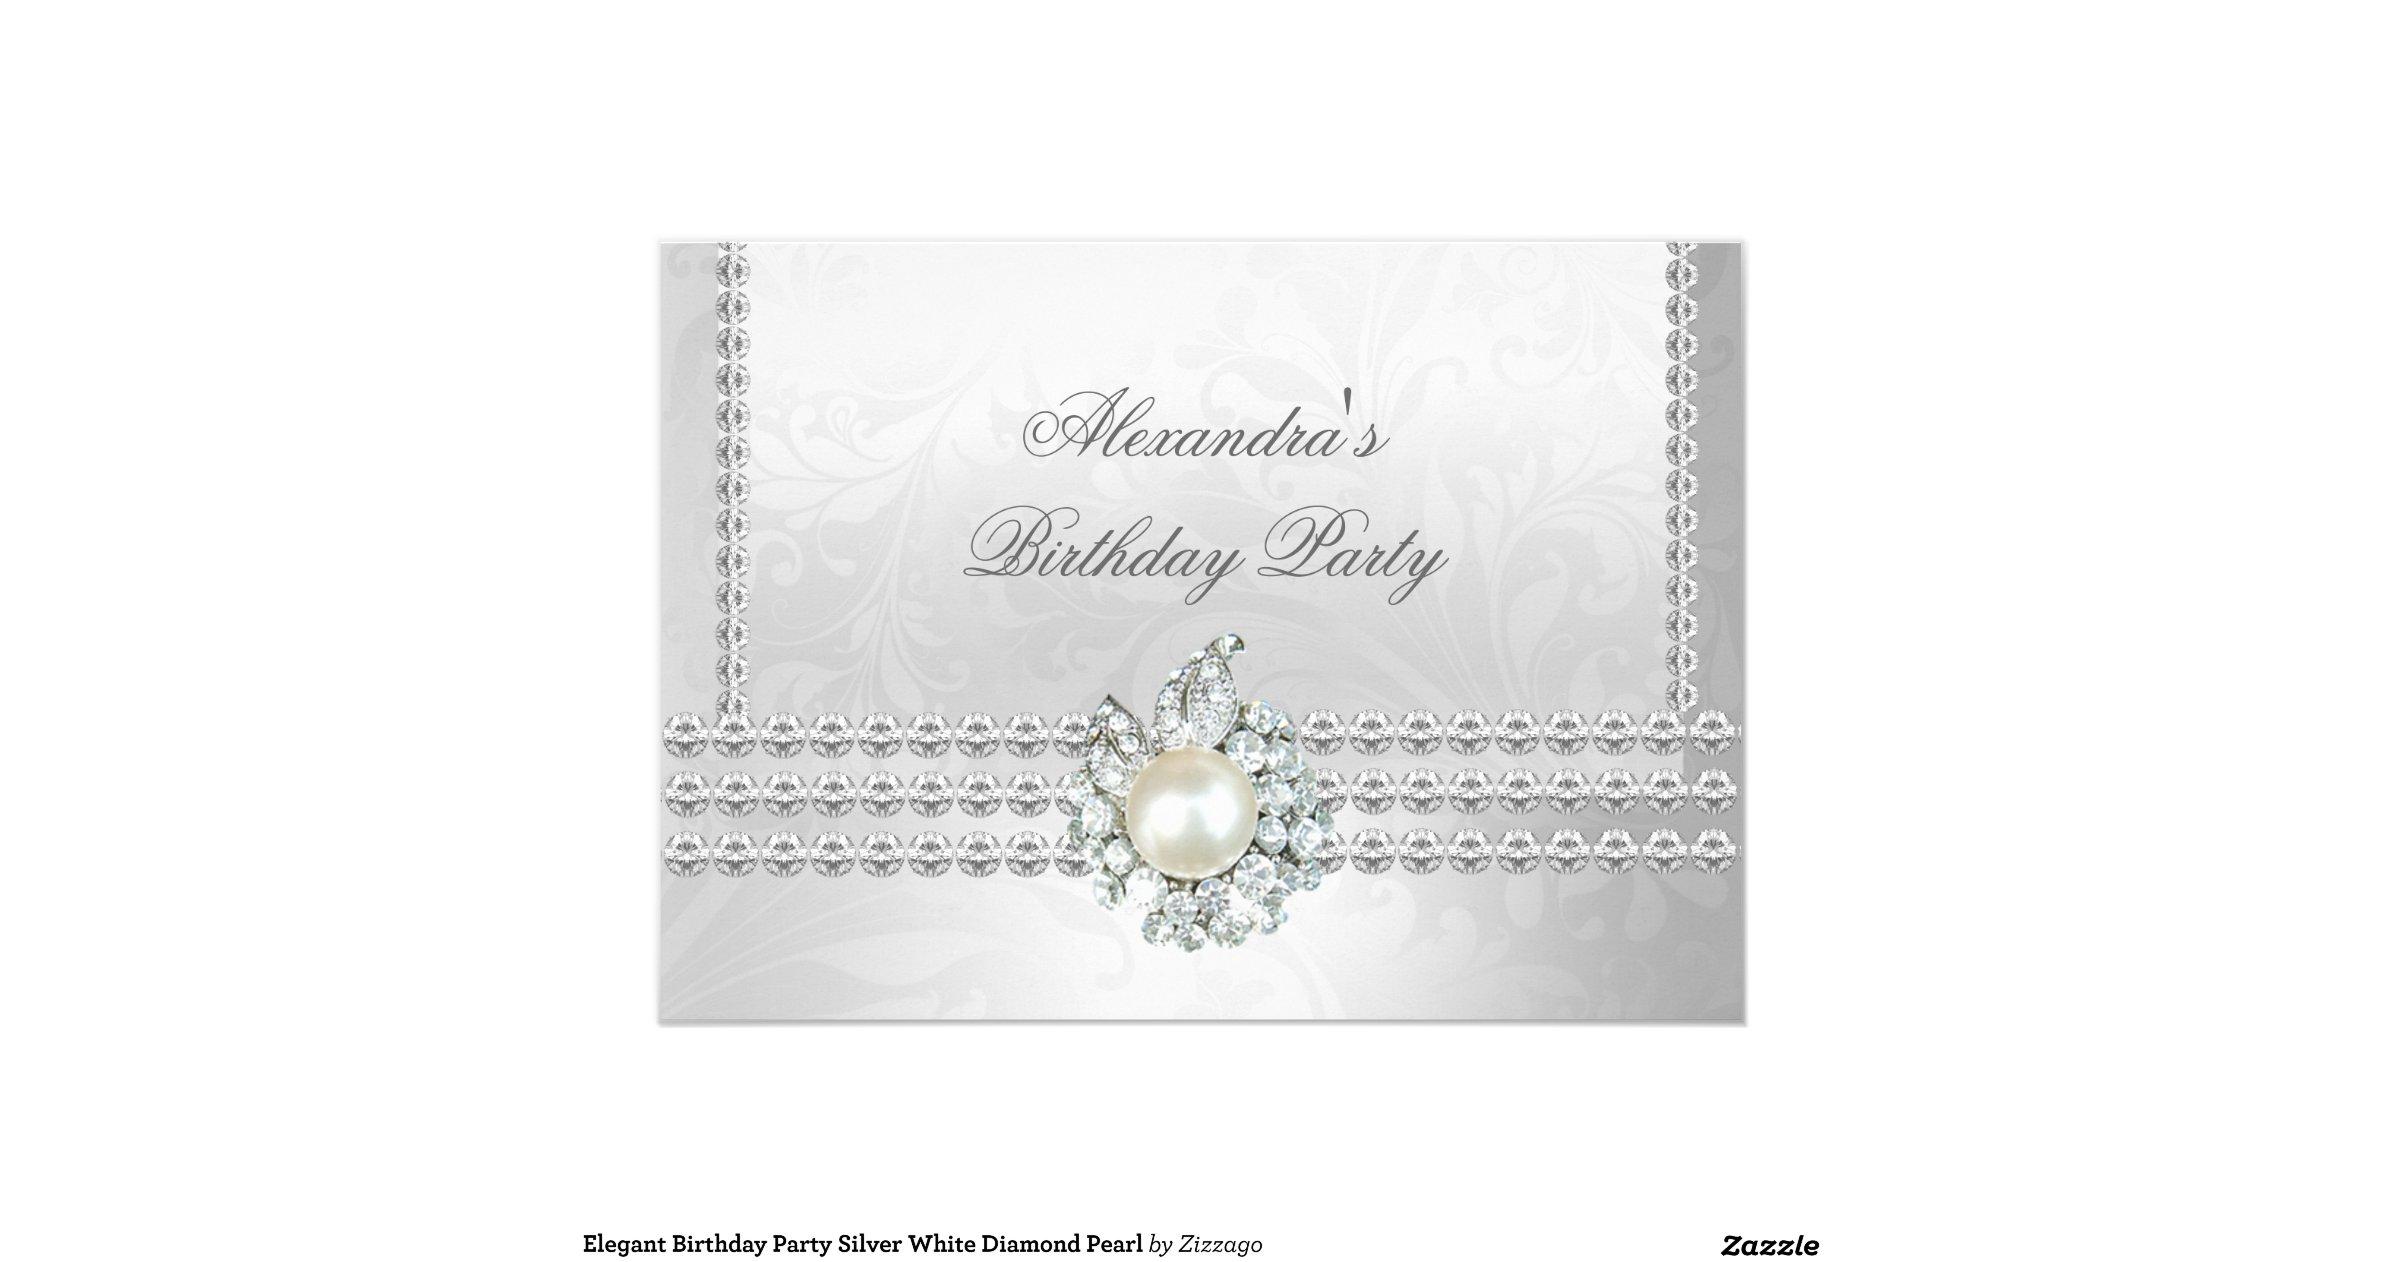 Snap Silver White Diamonds Pearl Elegant Birthday Party Card Zazzle ...